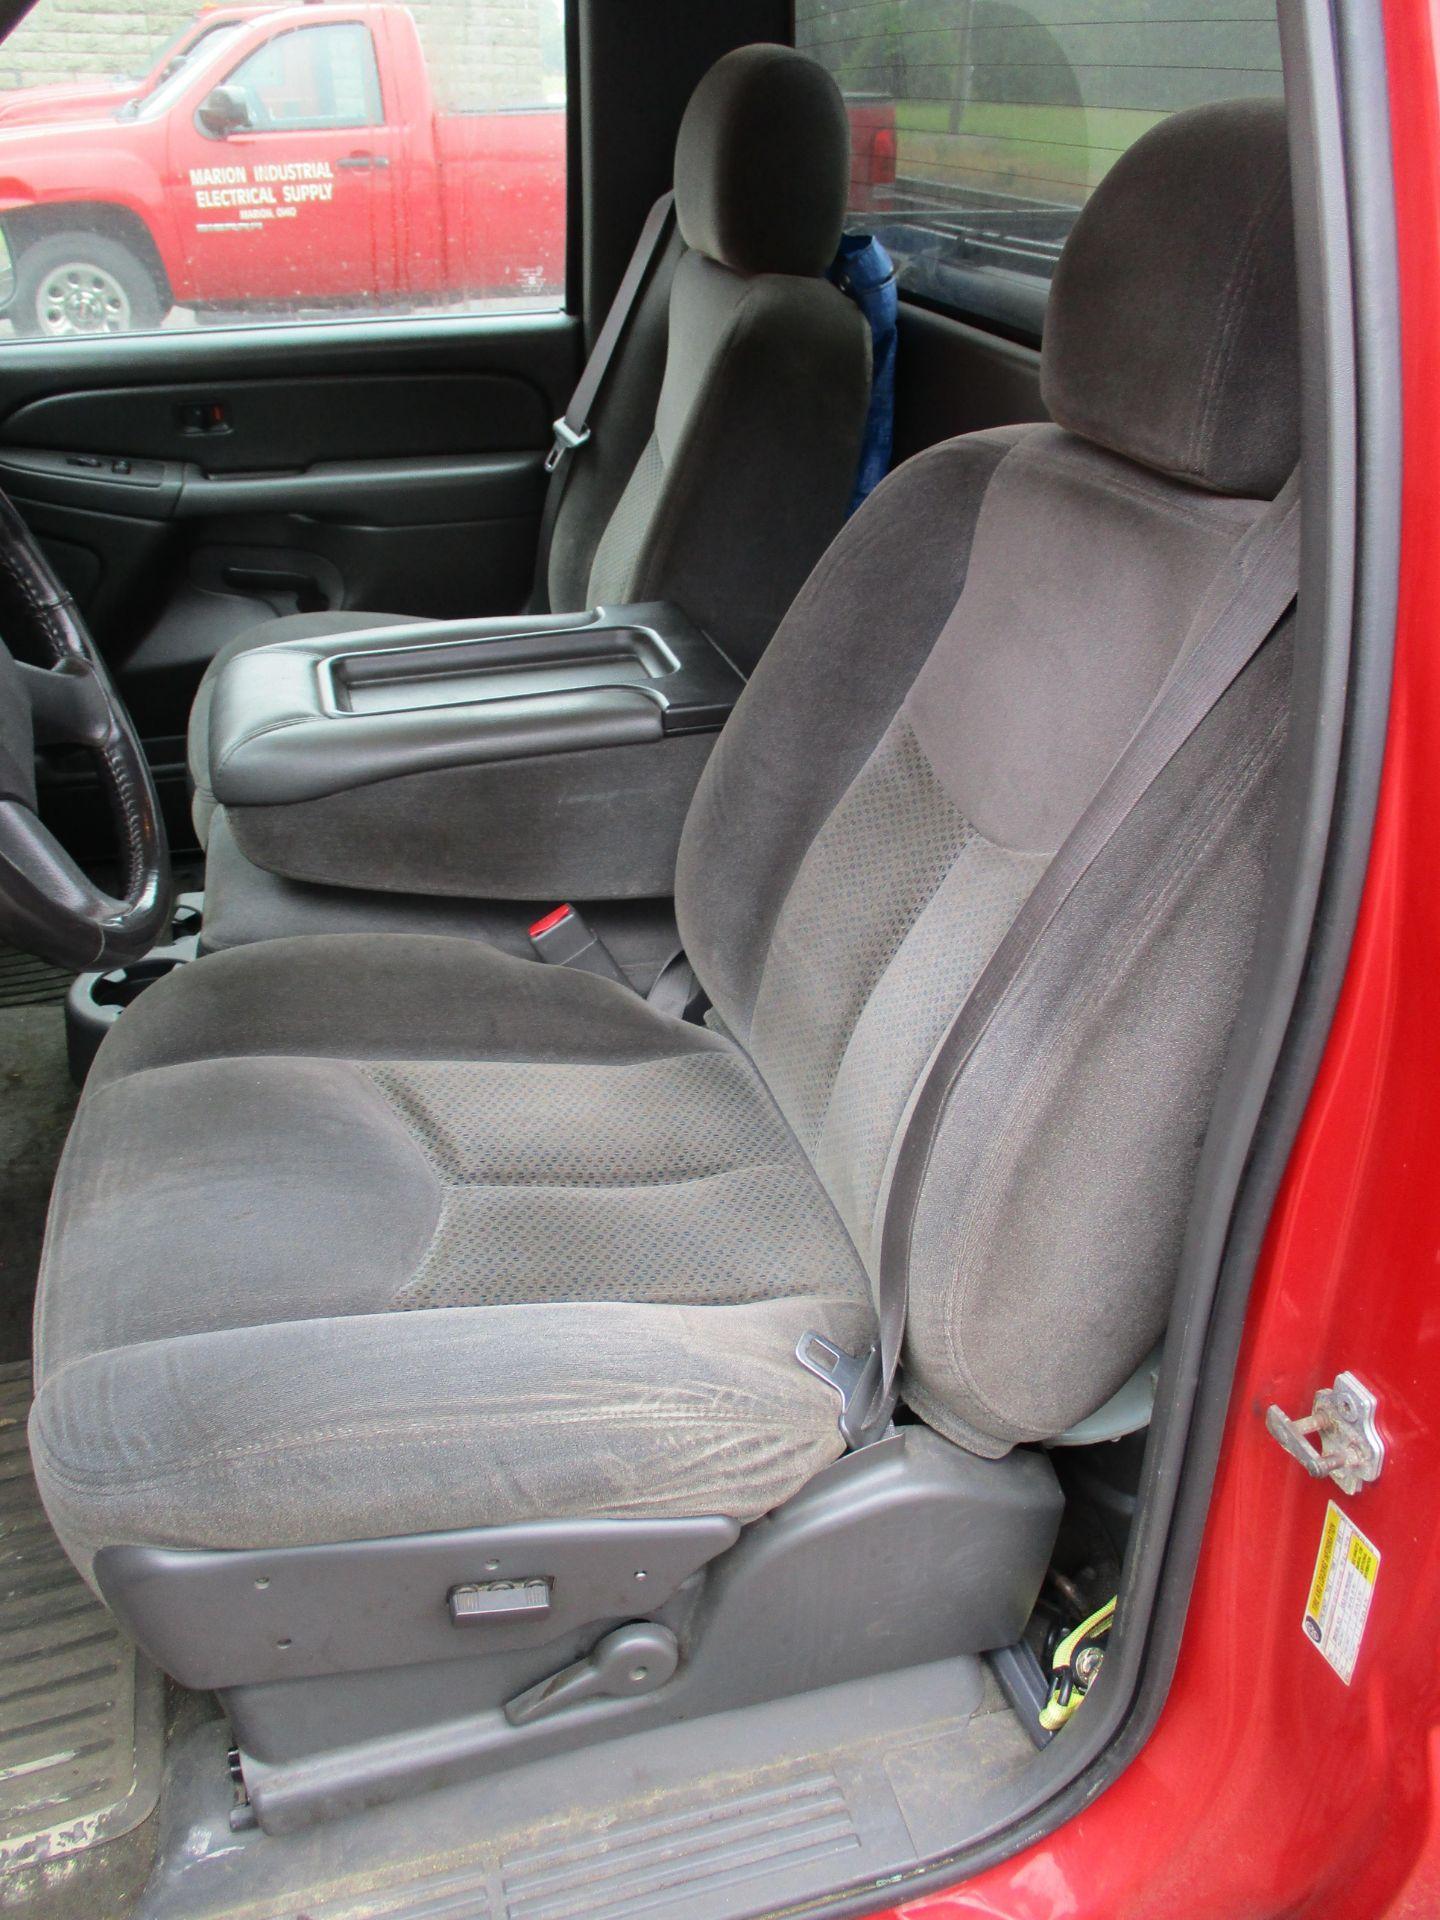 2006 Chevrolet Silverado 1500 LT Pickup, VIN 1GCEC14V96E251510, Regular Cab, Automatic, AC, 8' - Image 11 of 21